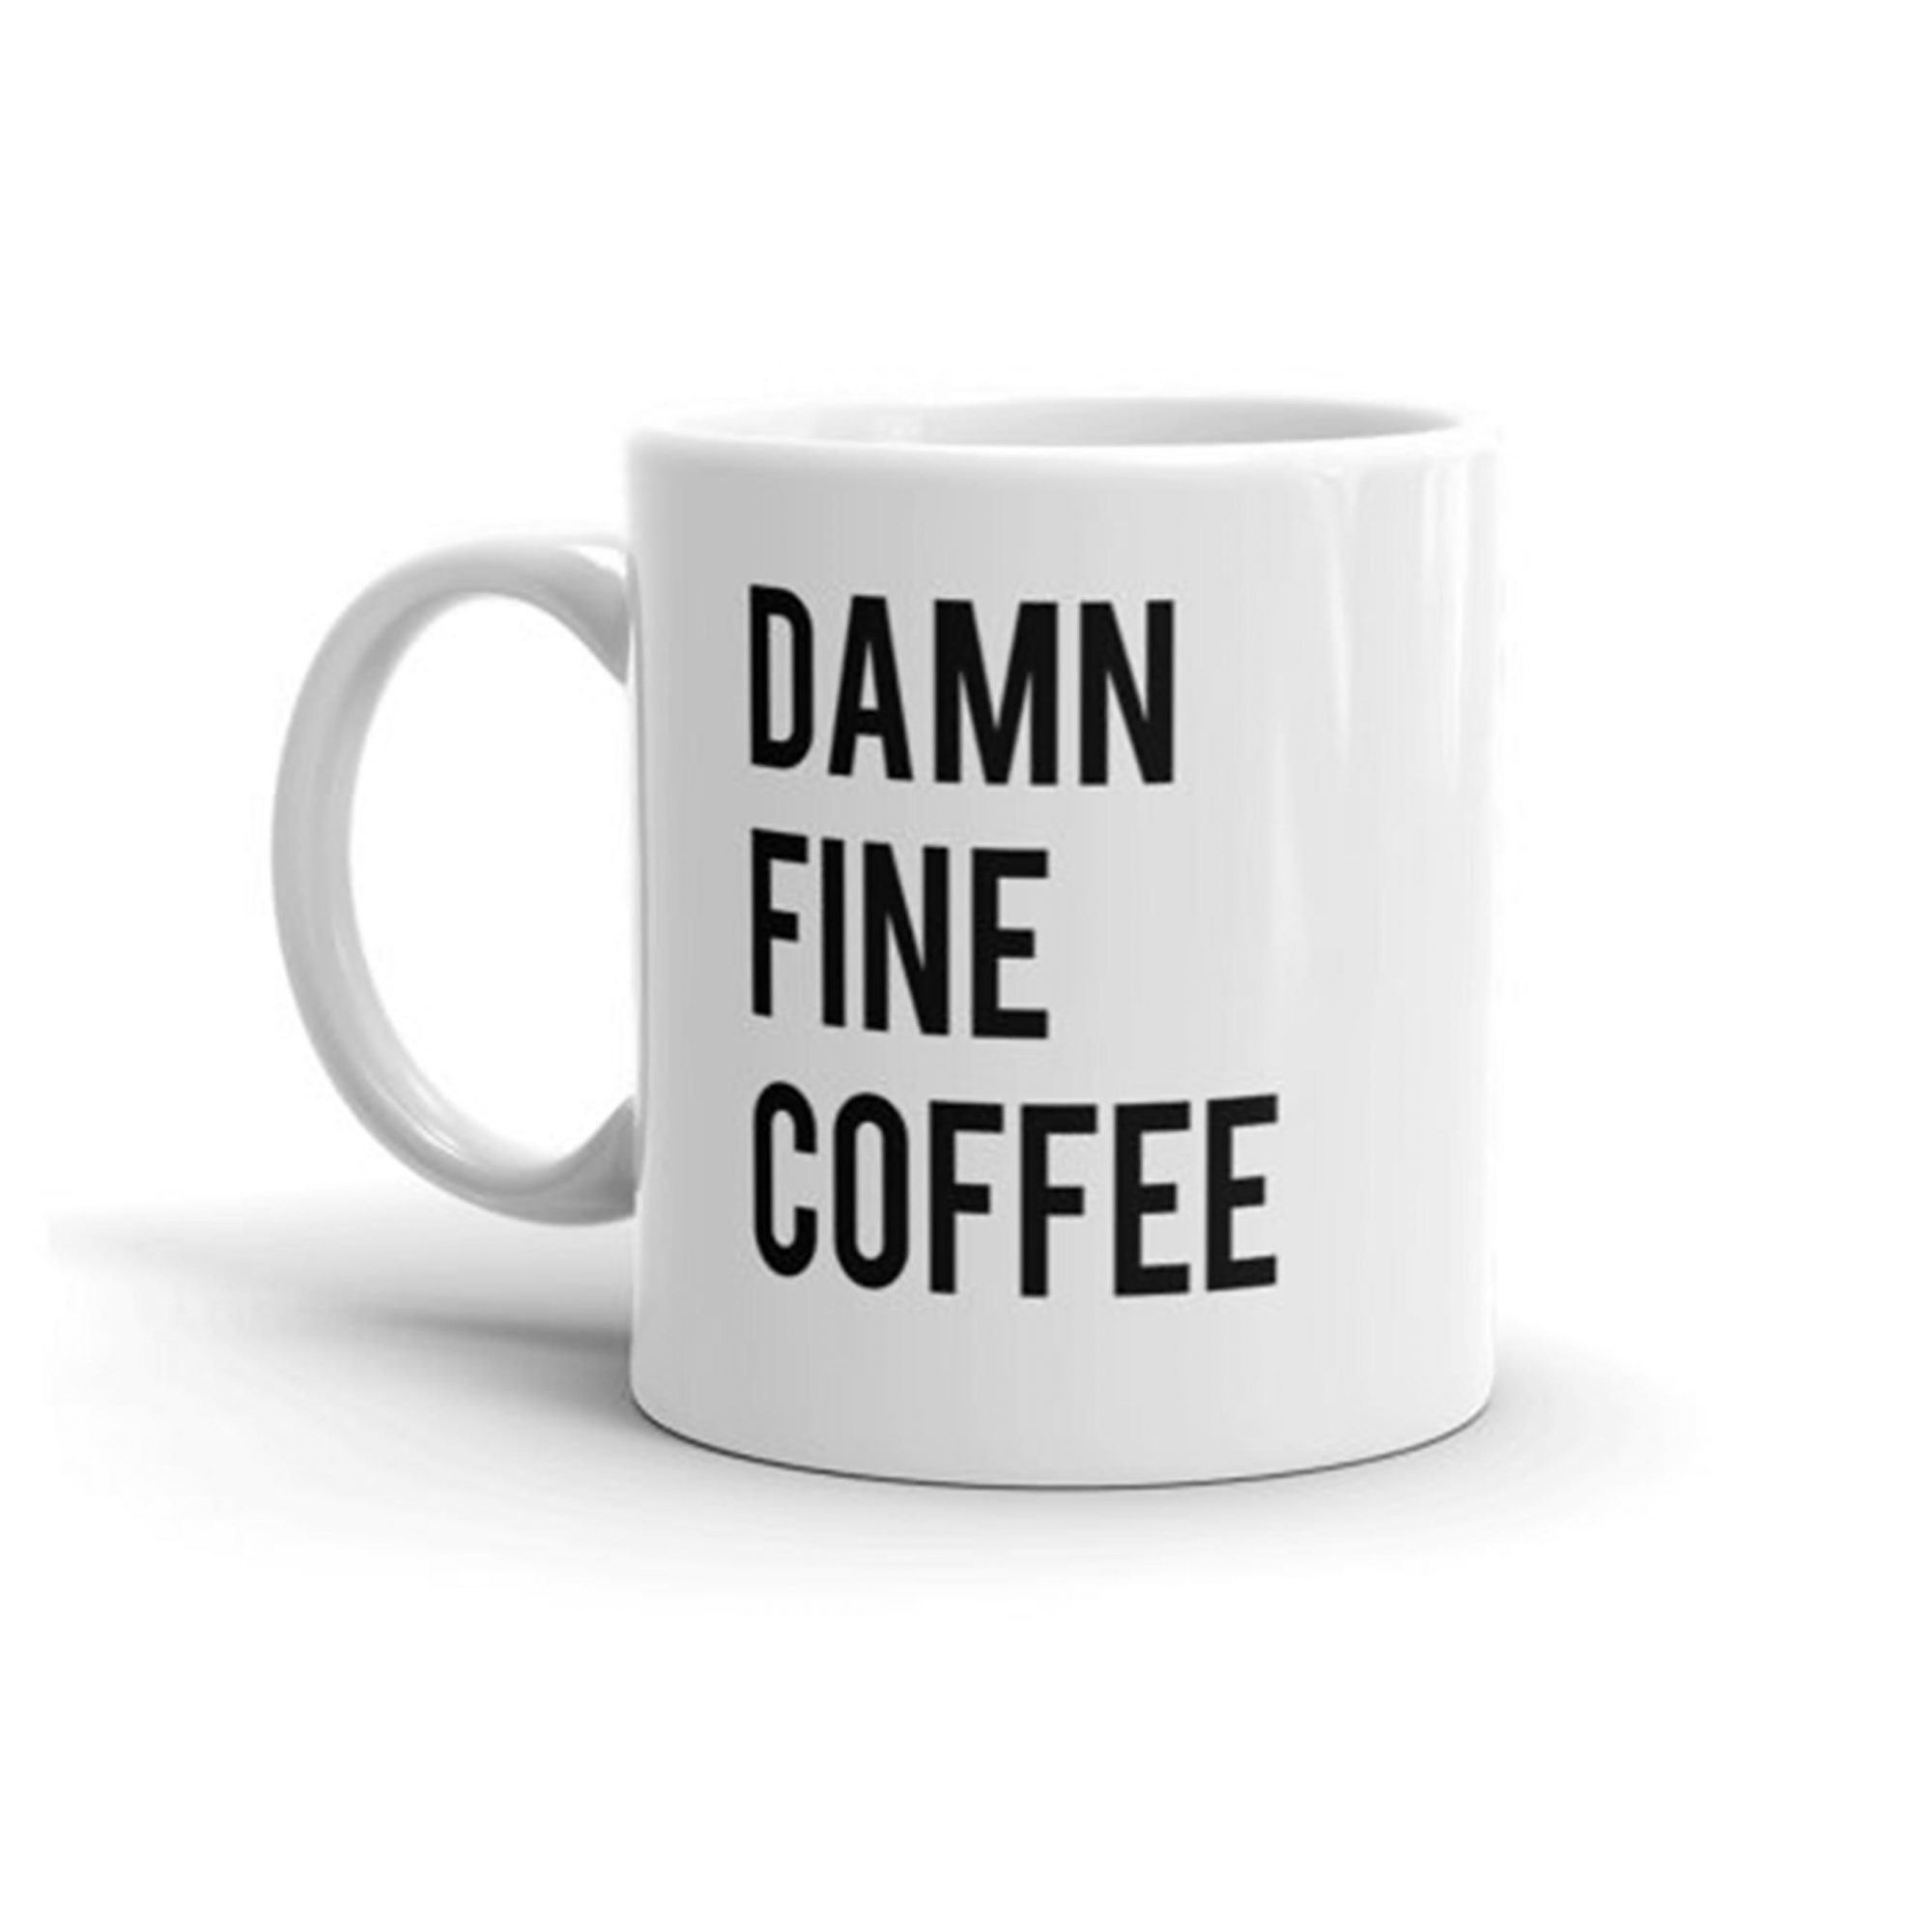 Damn-fine-coffee